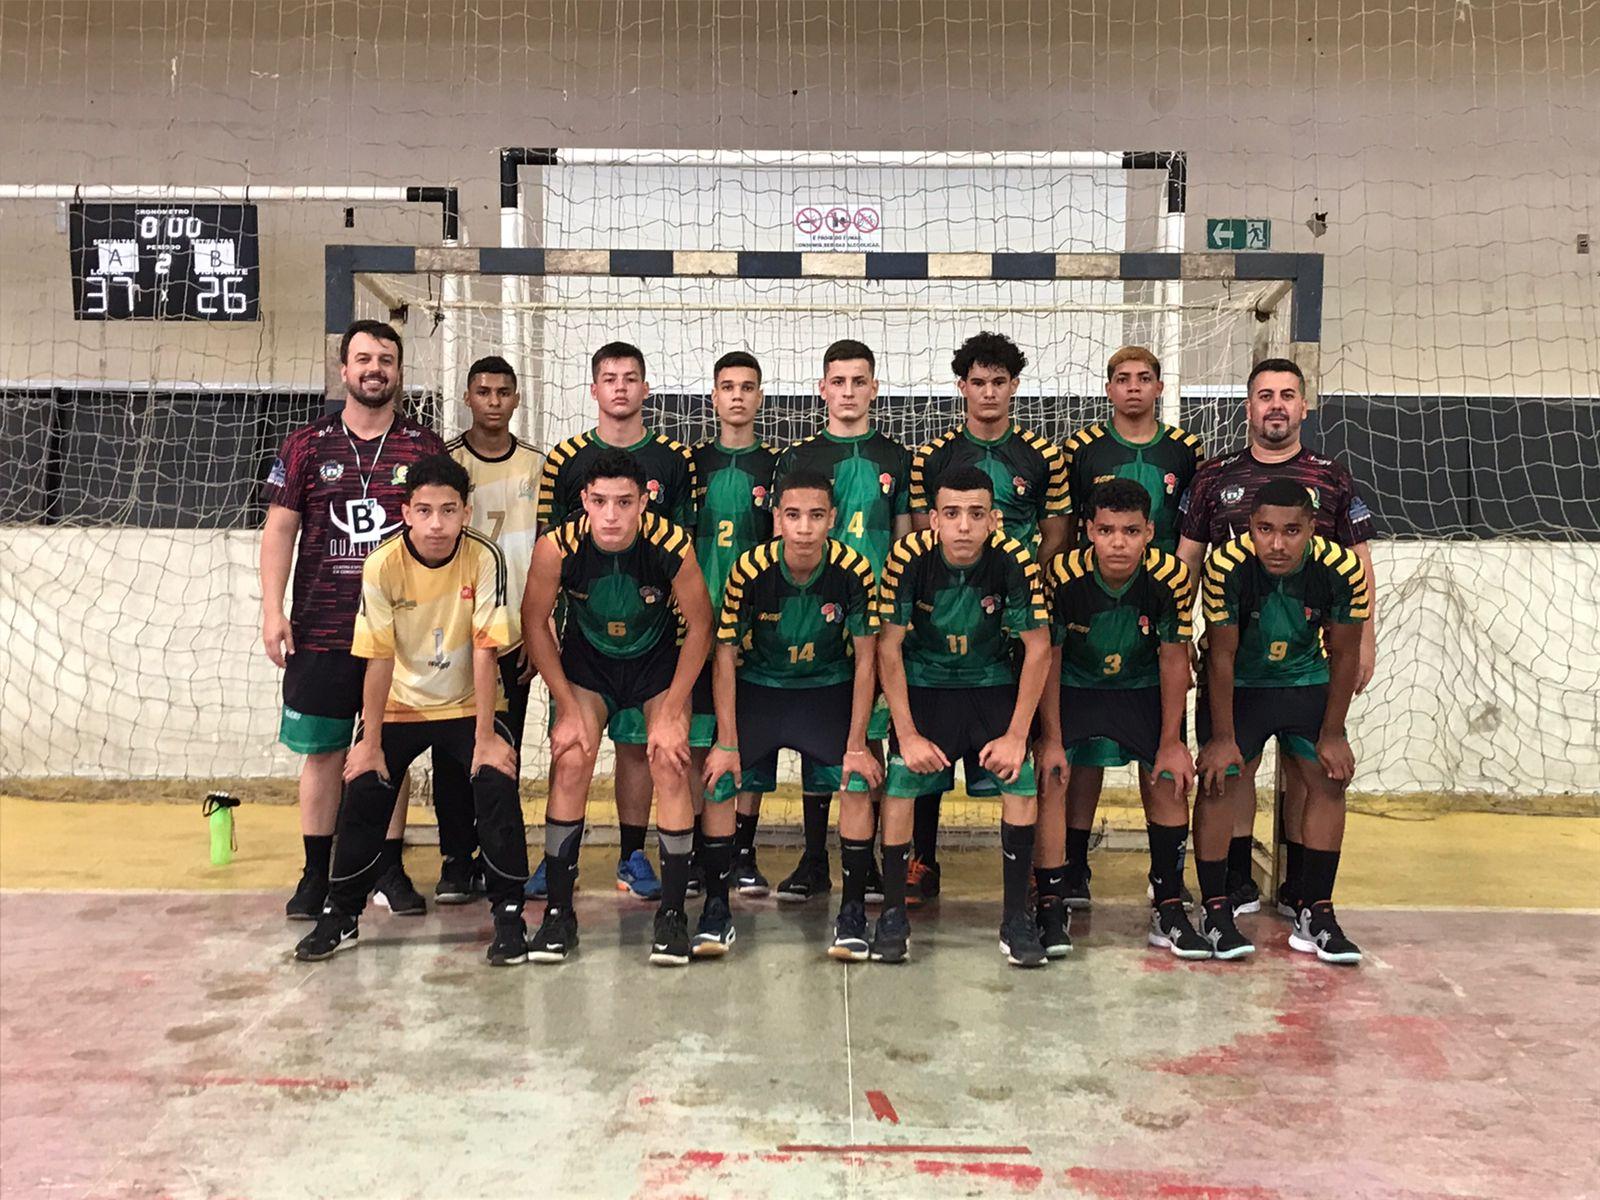 AERV vence a segunda partida no Brasileiro de Handebol